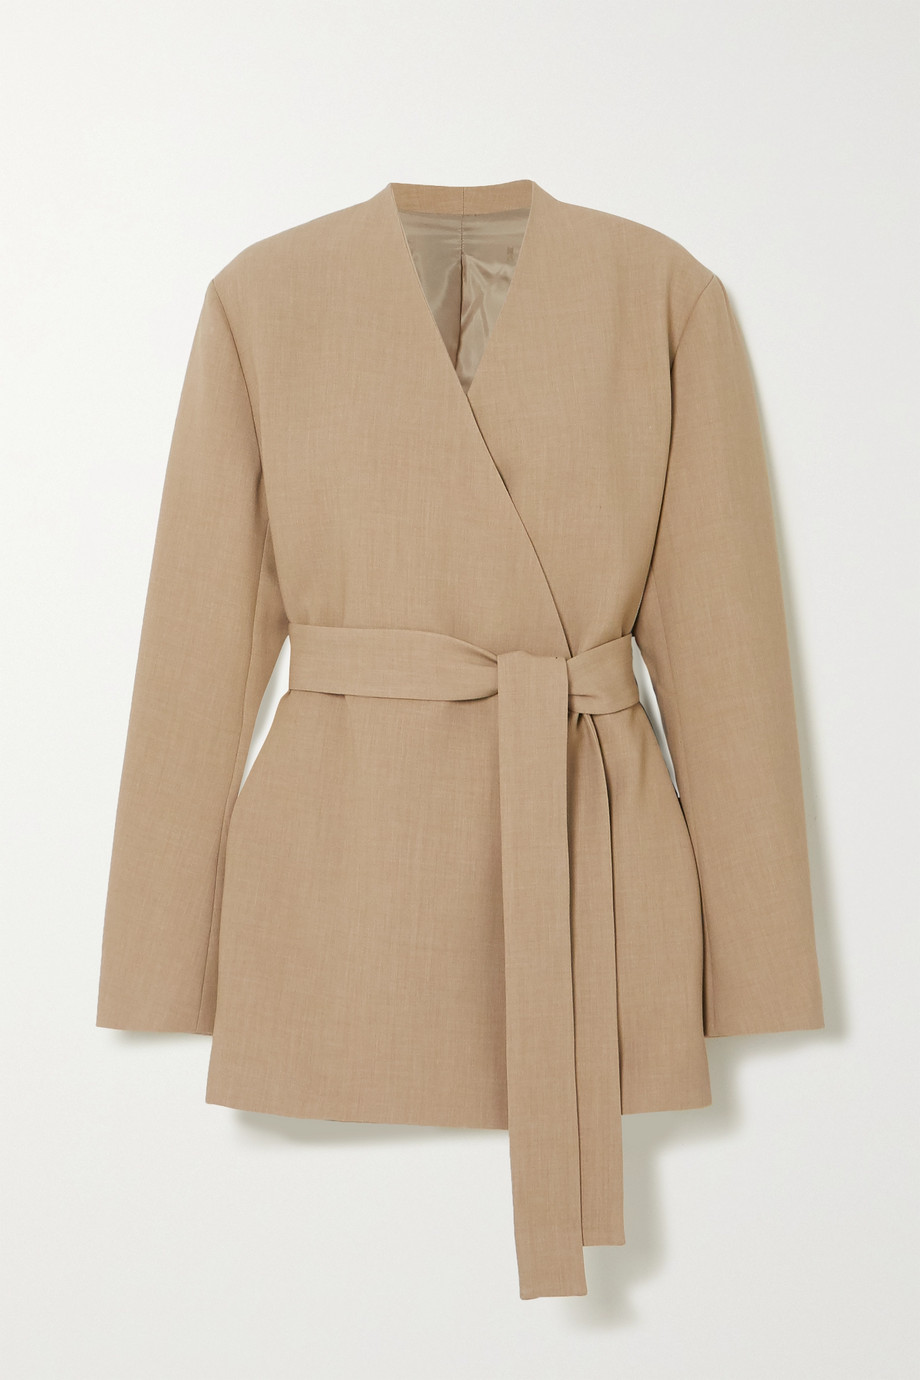 Frankie Shop 大廓形配腰带梭织西装外套